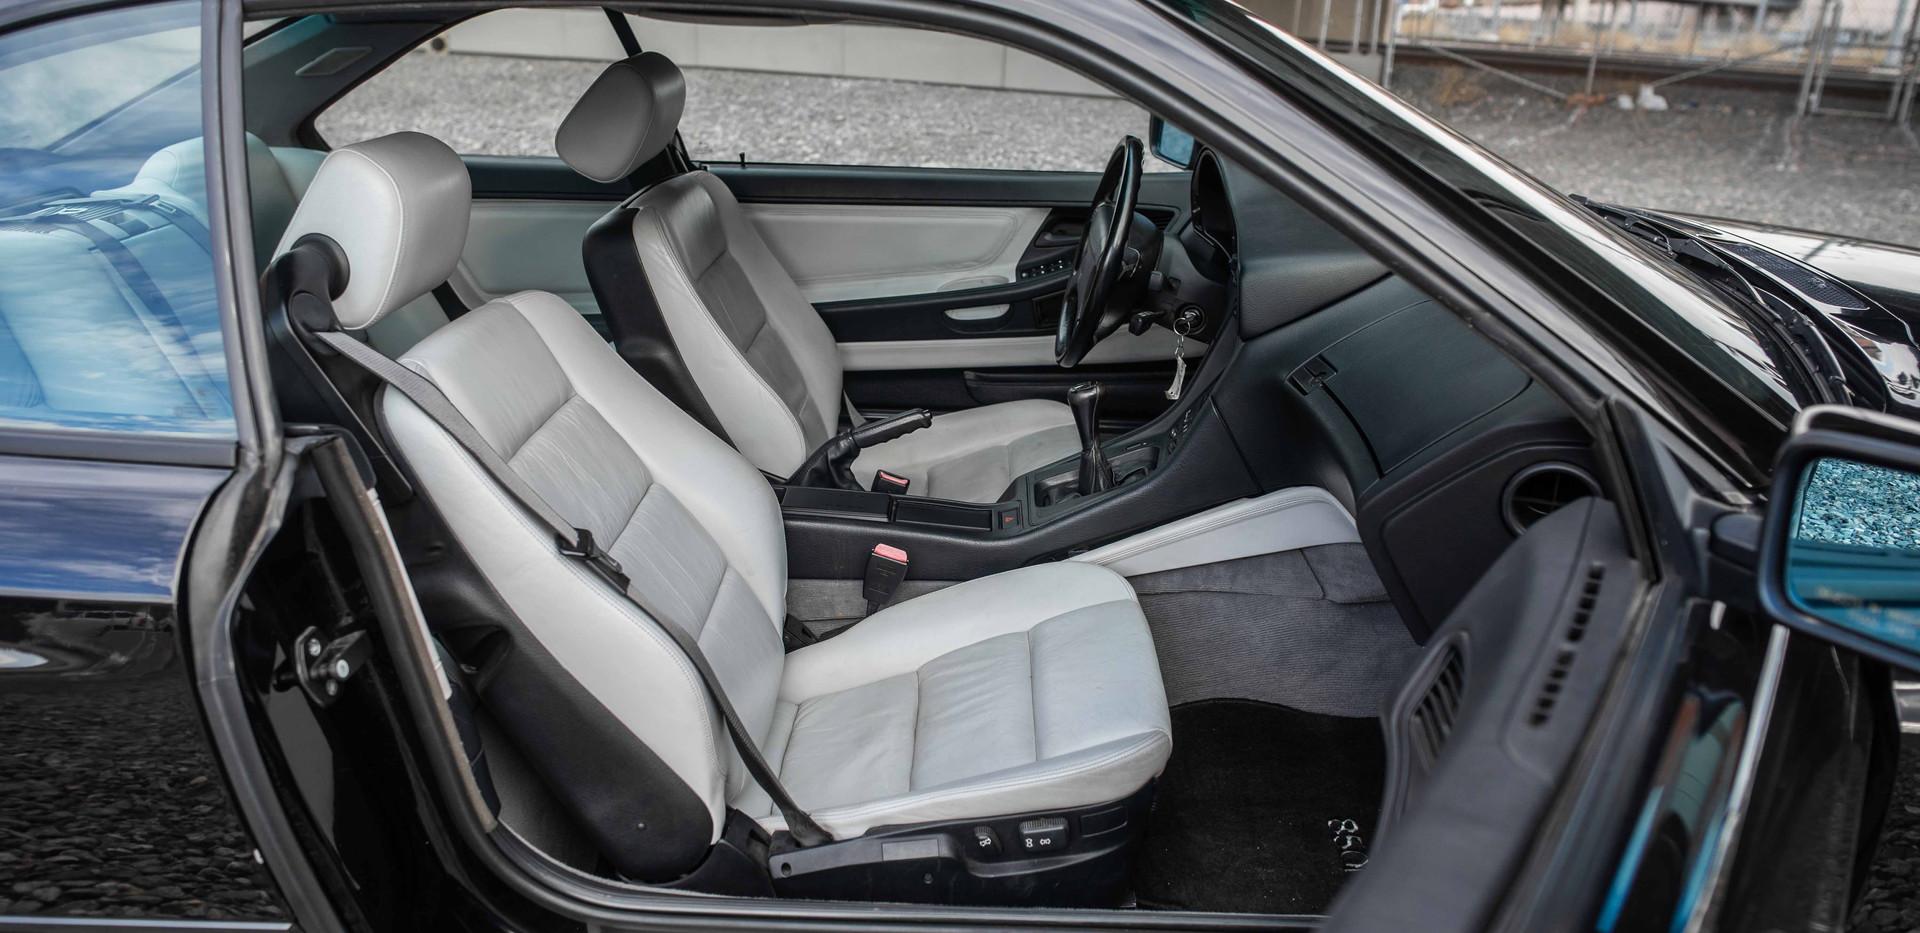 Interior_Passenger_Front_Seats_2_850.jpg